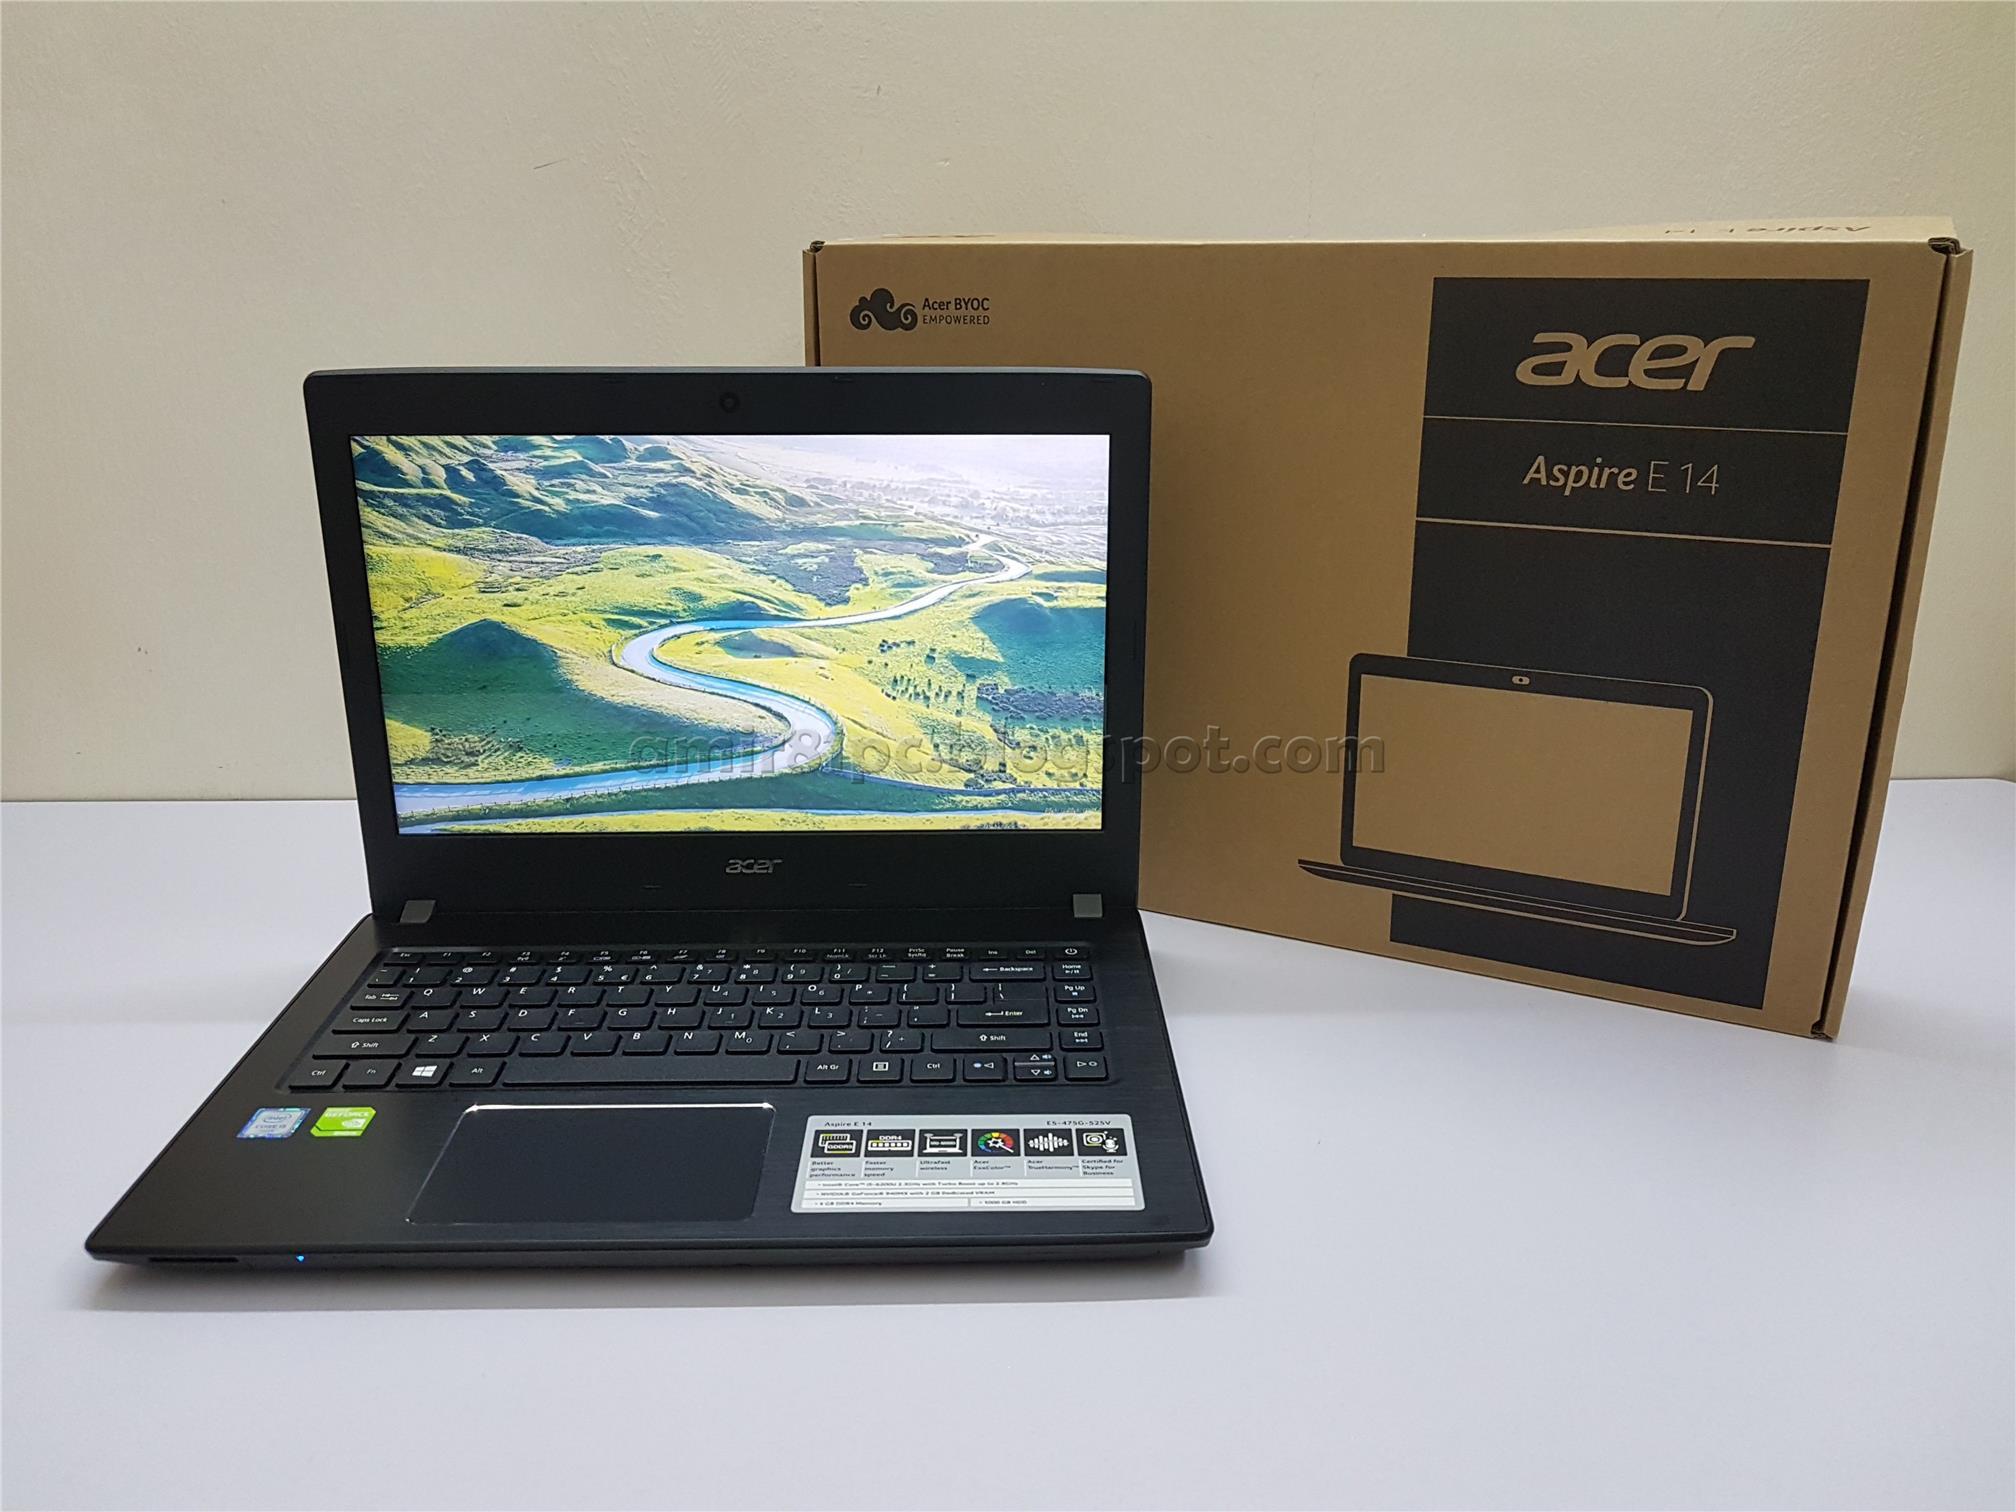 Promo Acer Aspire E5 475g 5574 Gr Notebook I5 7200u Ram 4gb Hdd 1tb Grey Ddr4 Gt940mx 2gb Ddr5 Dos Jual Welcome To